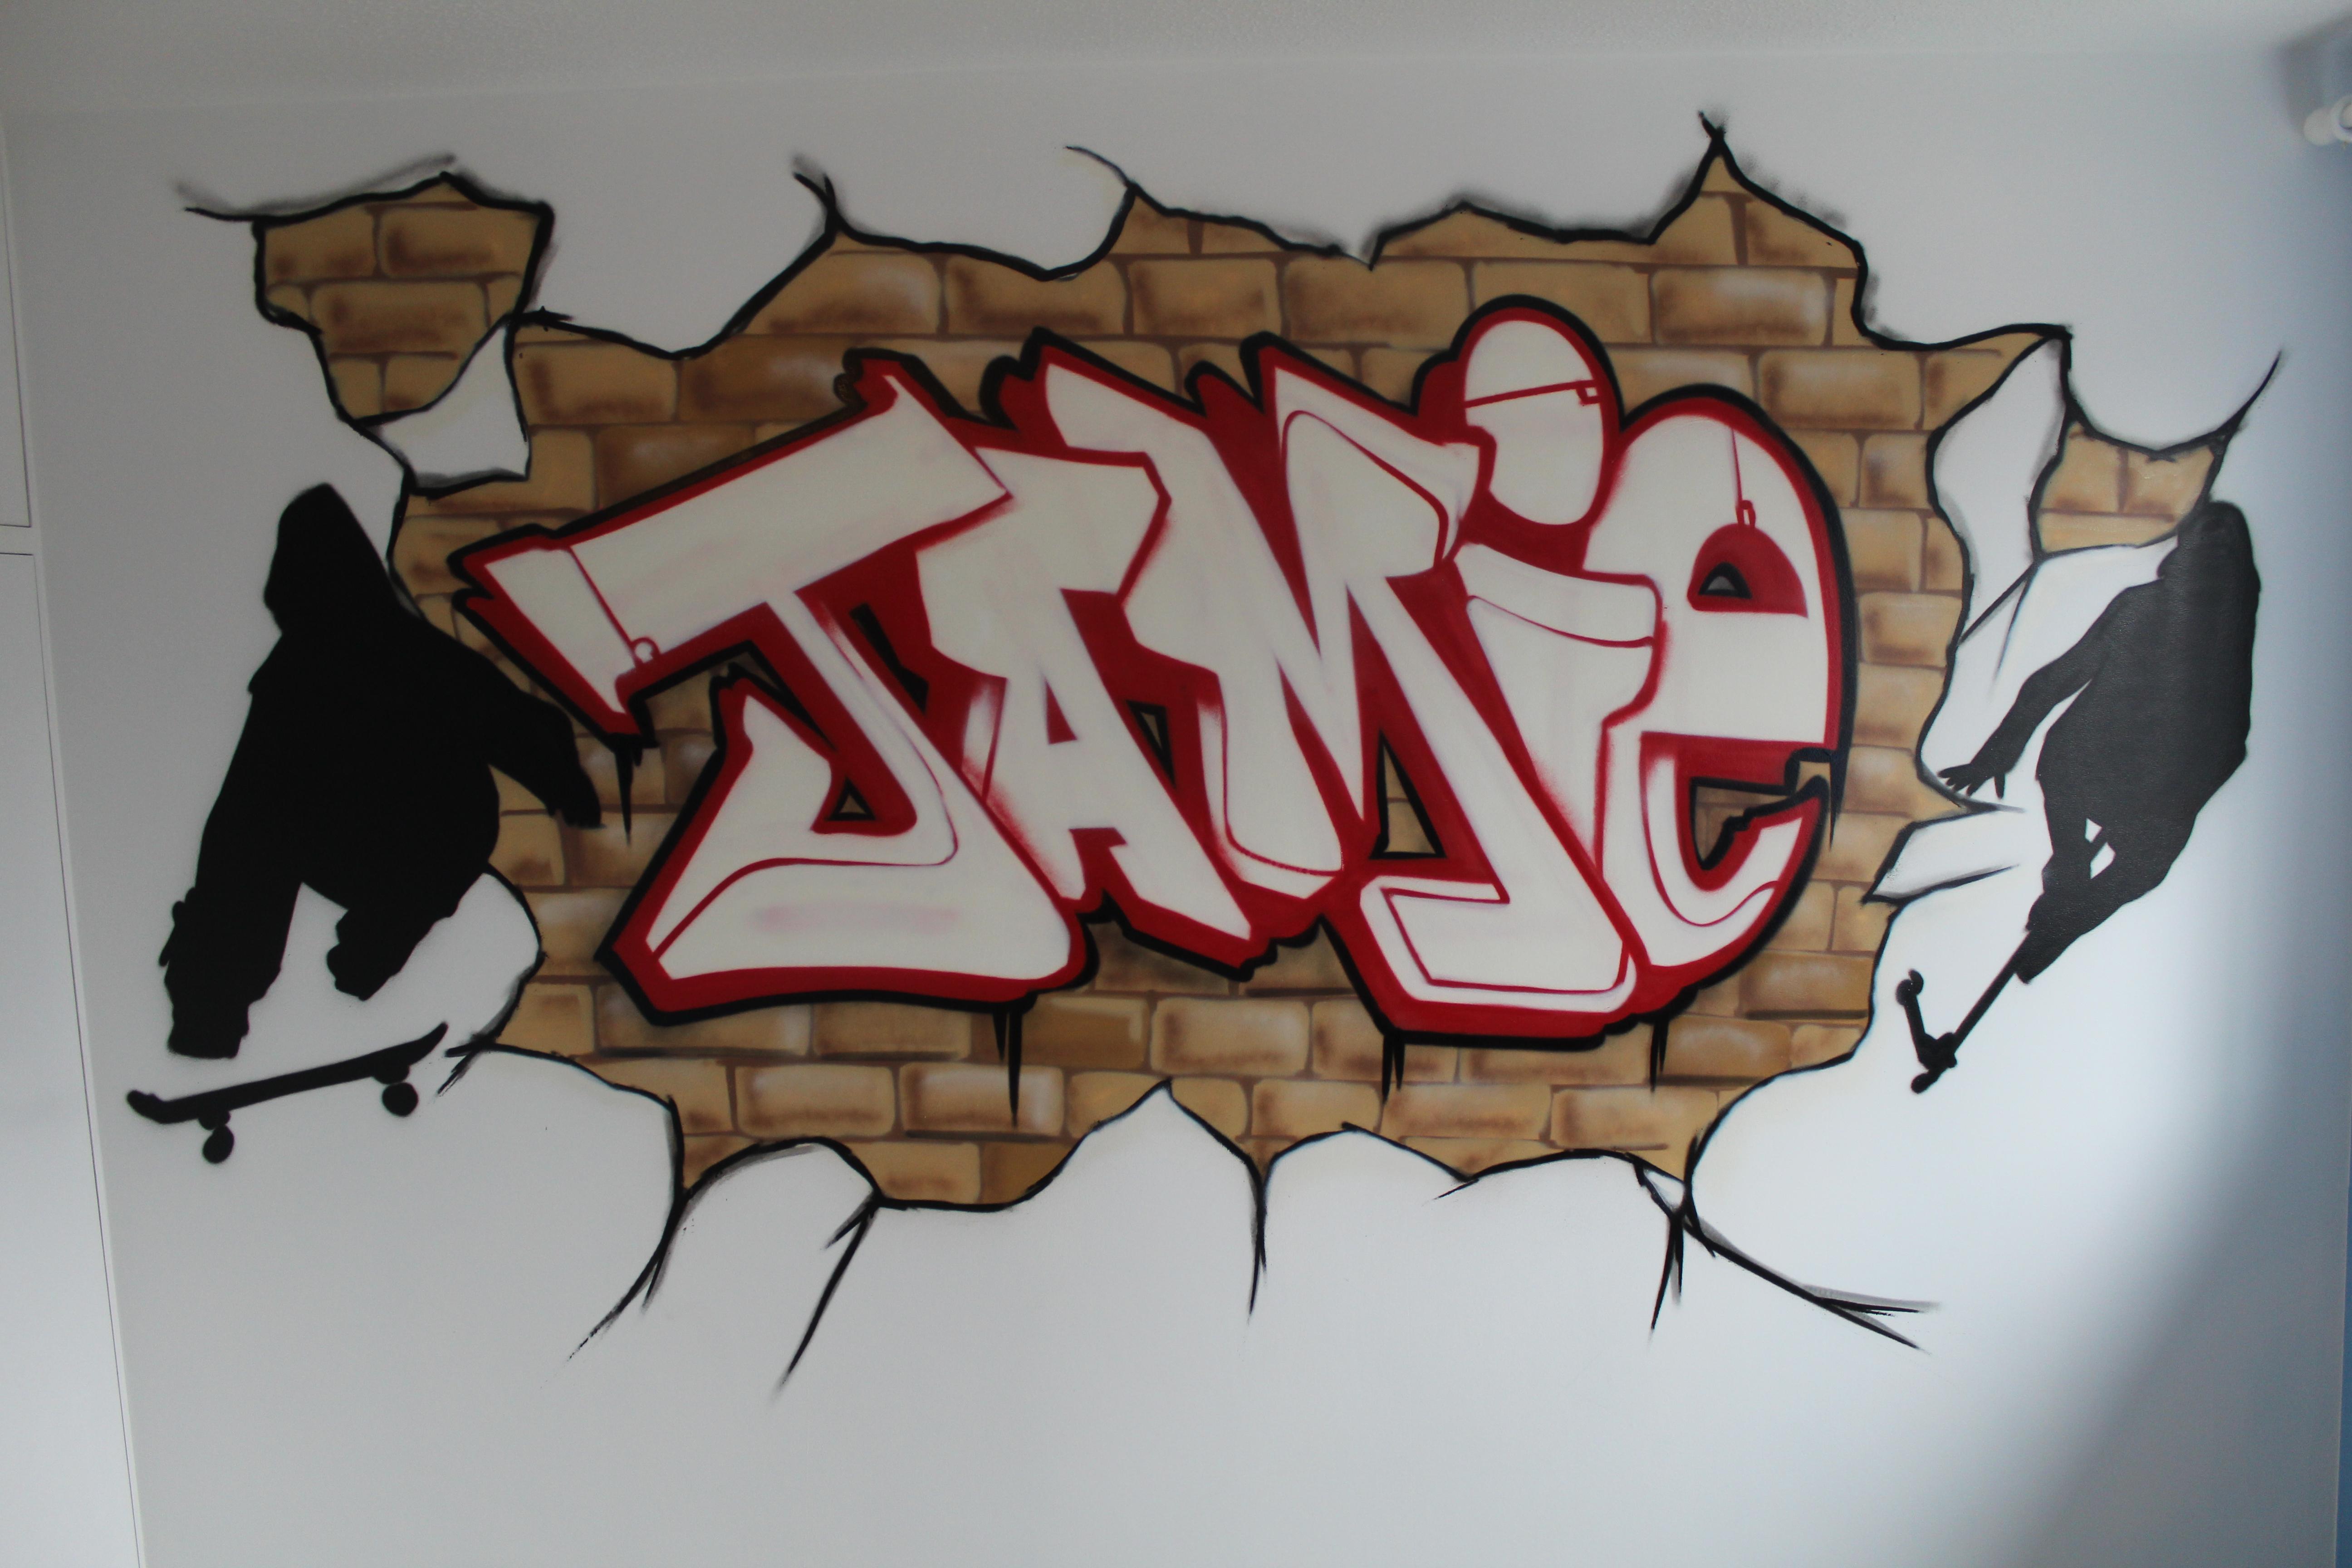 Wednesday inspiration graffiti types blog - Bedroom wall graffiti ideas ...